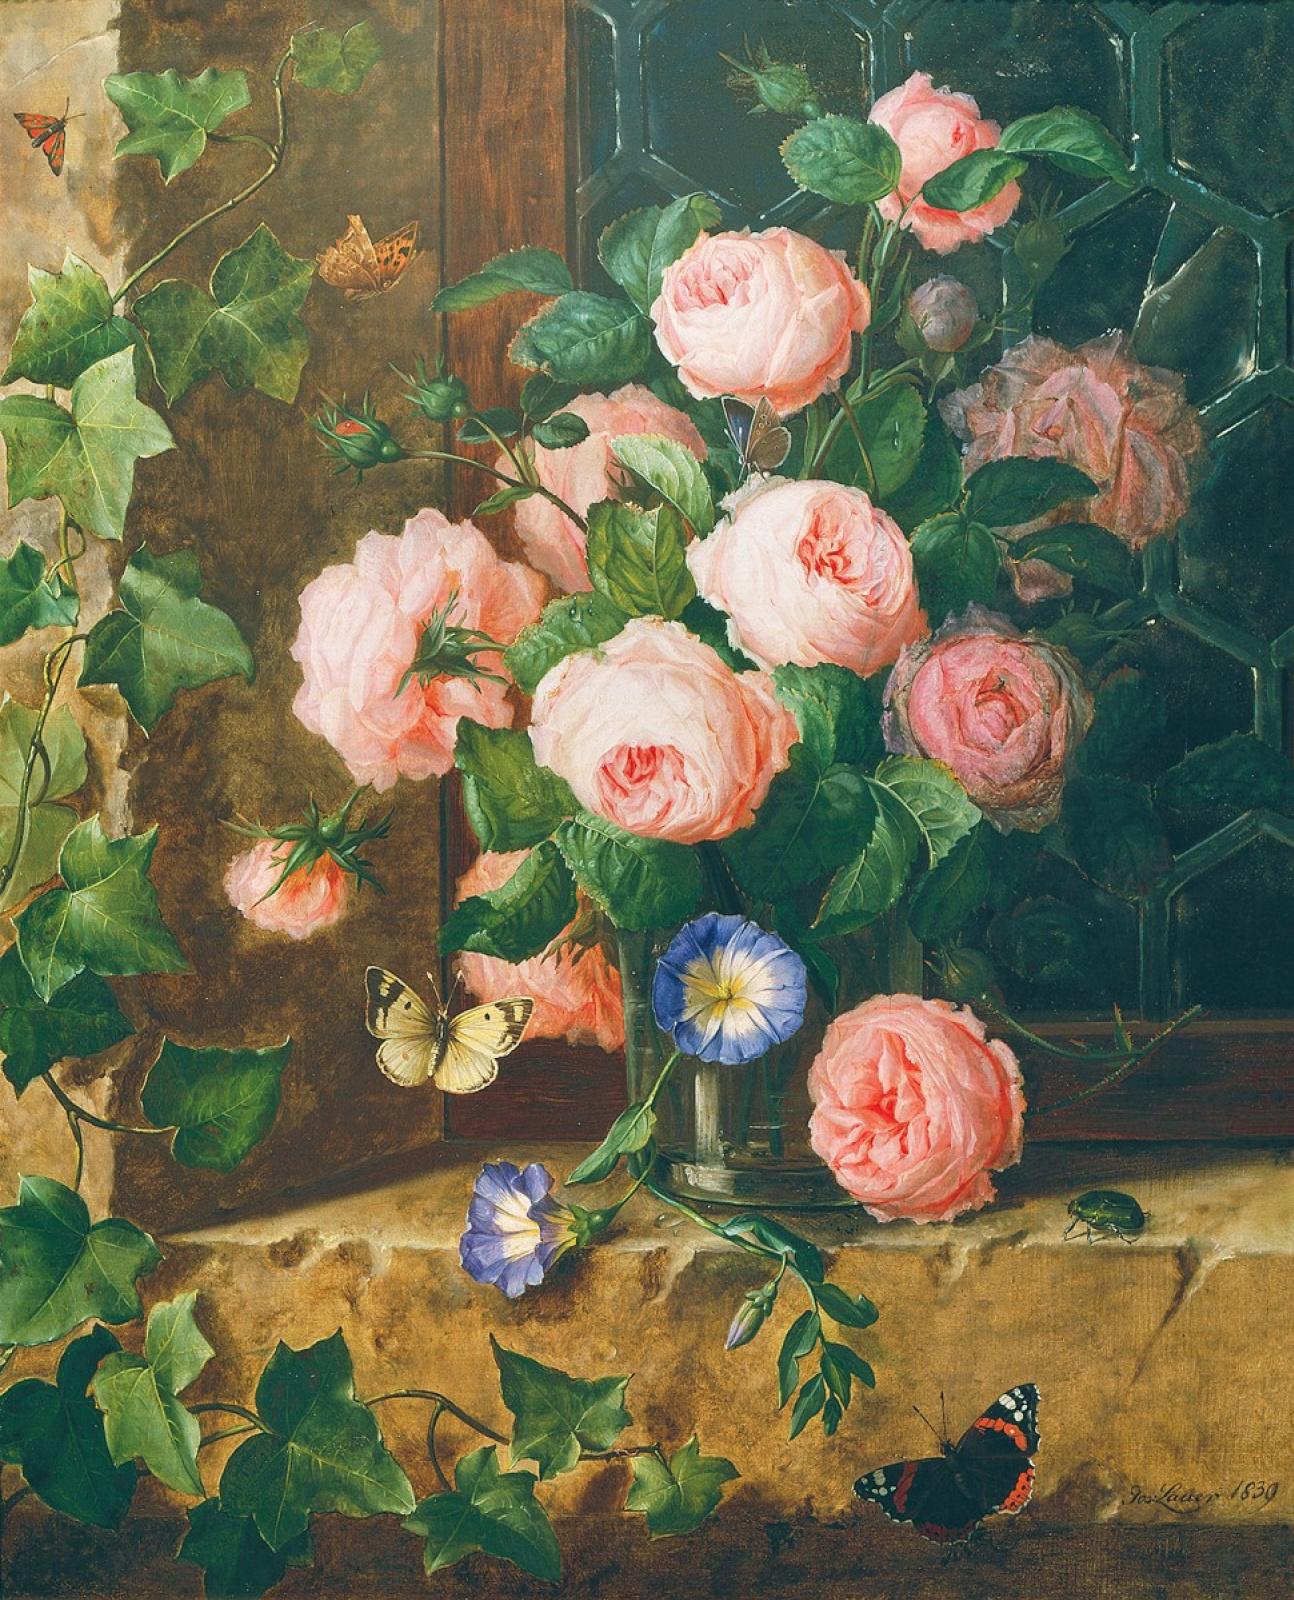 Йозеф Лауэр. Натюрморт с цветами